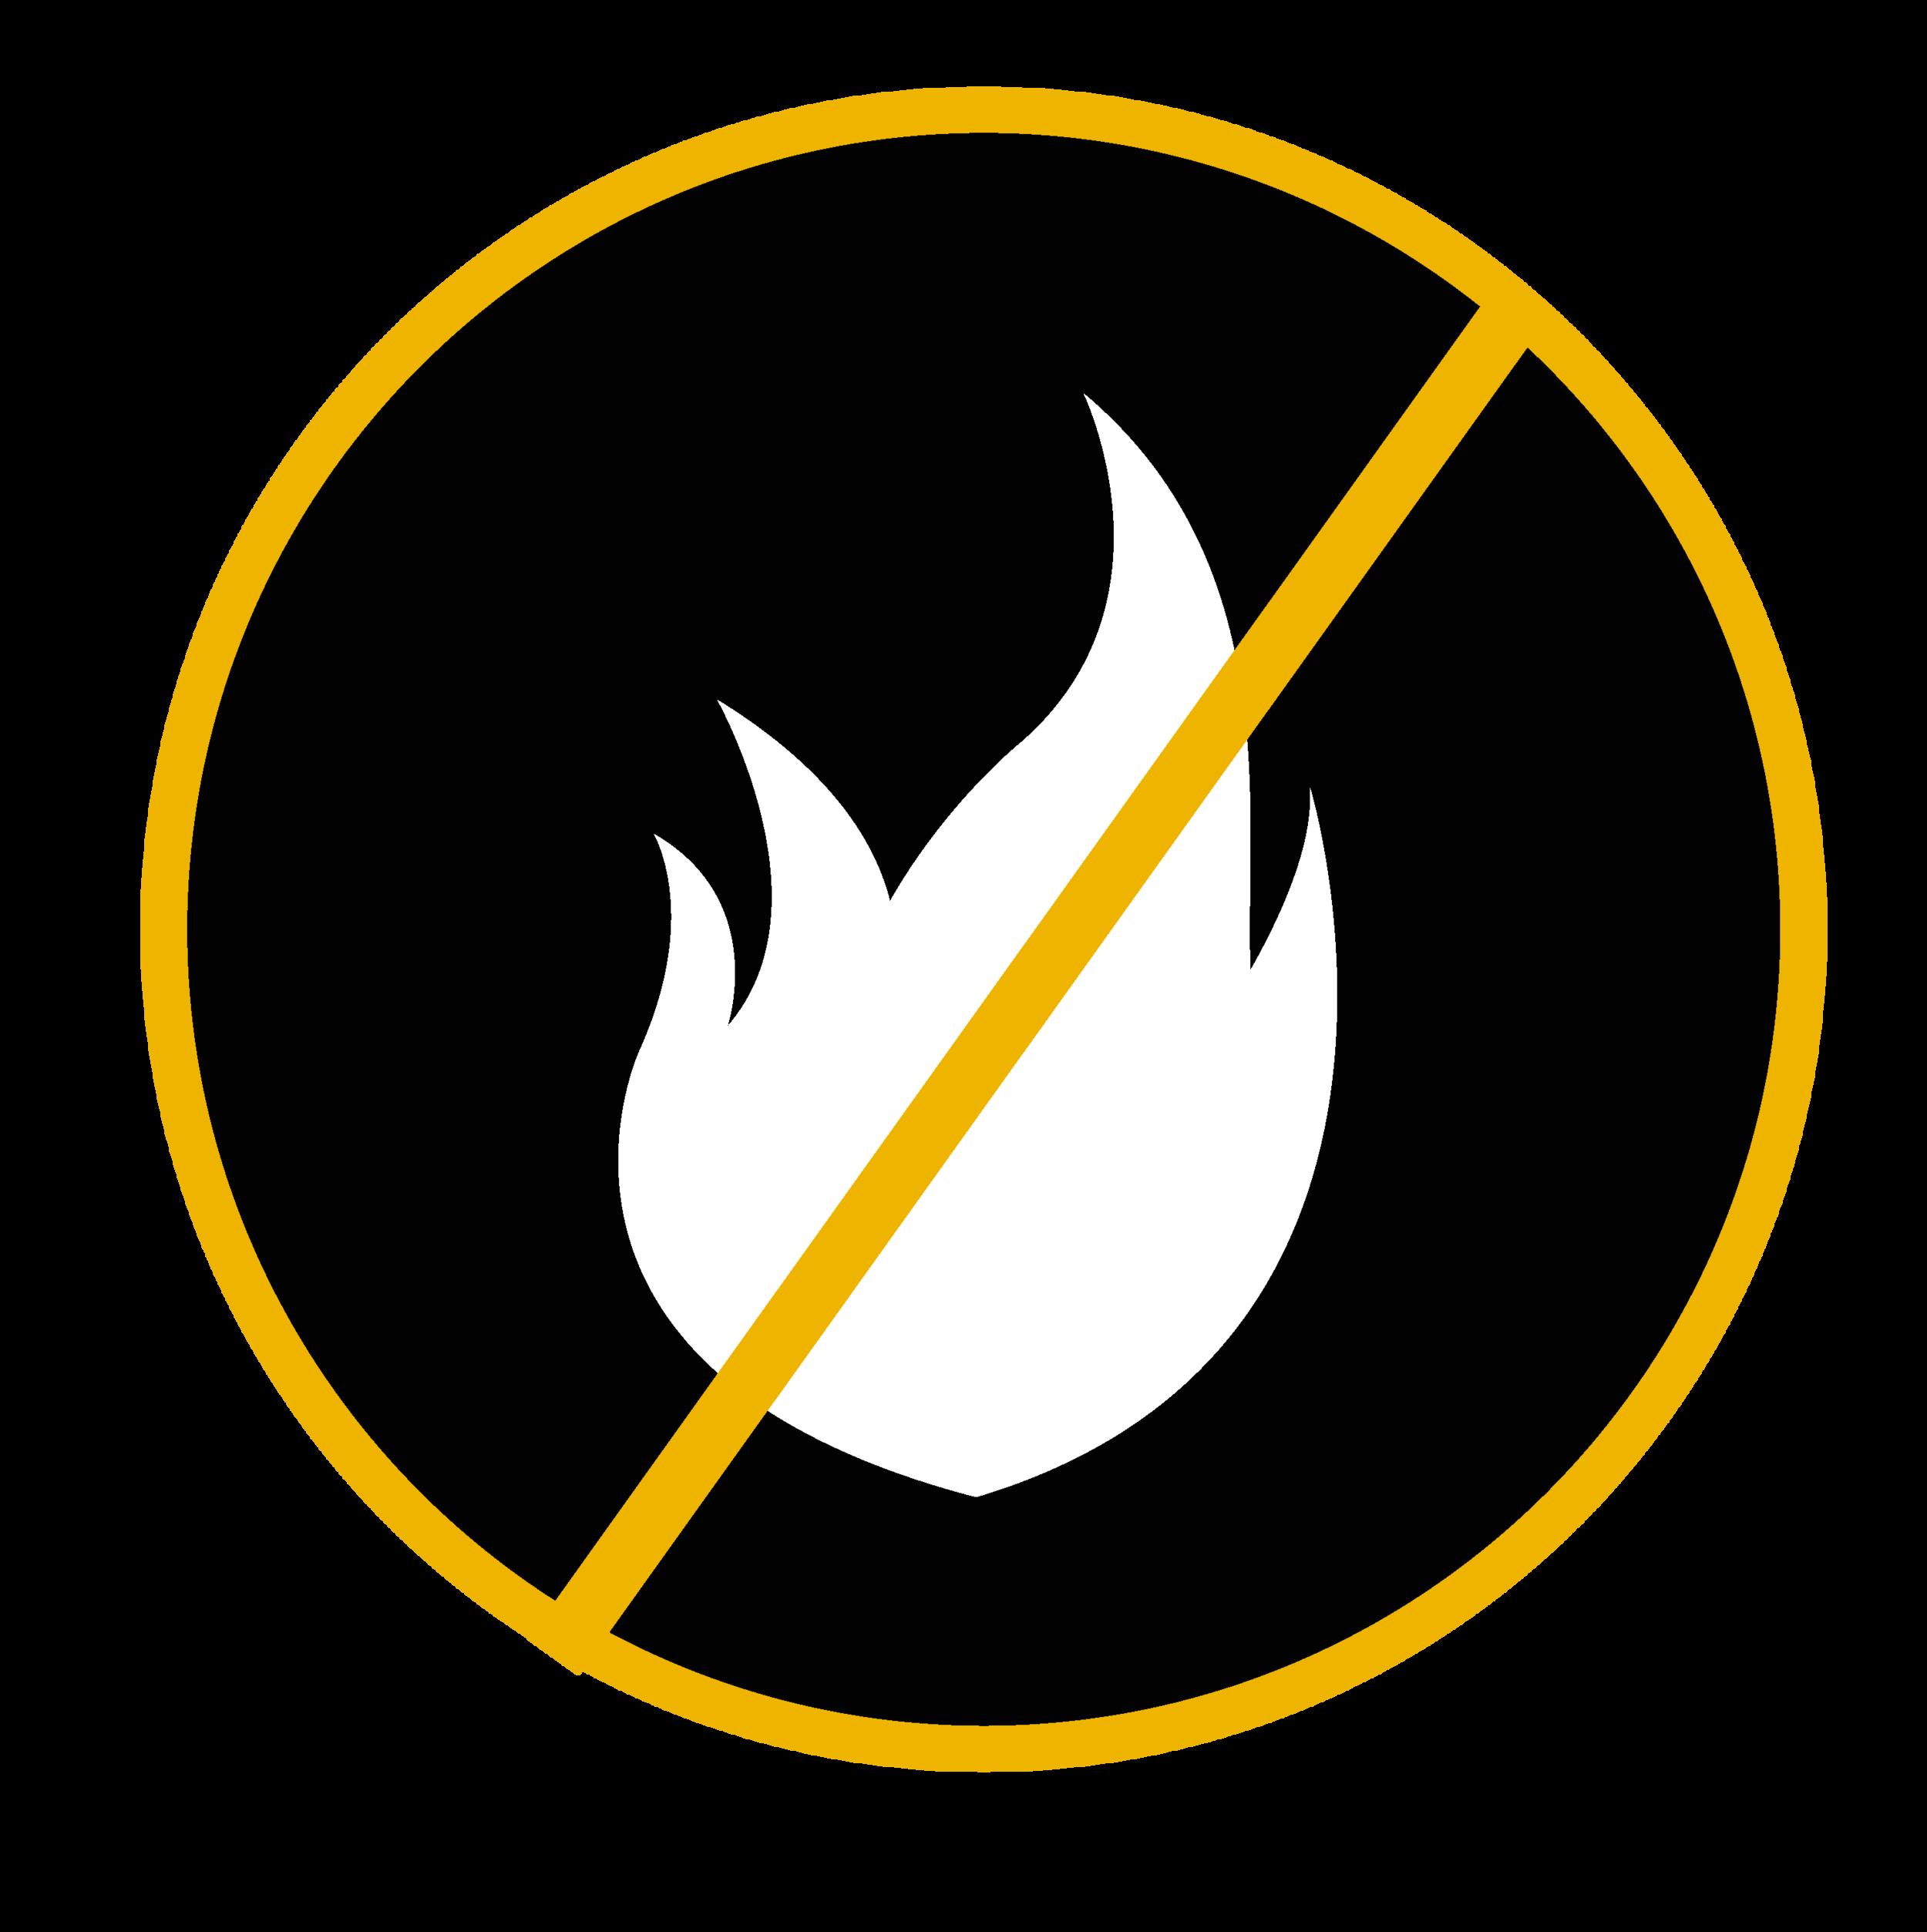 Fire Resistance